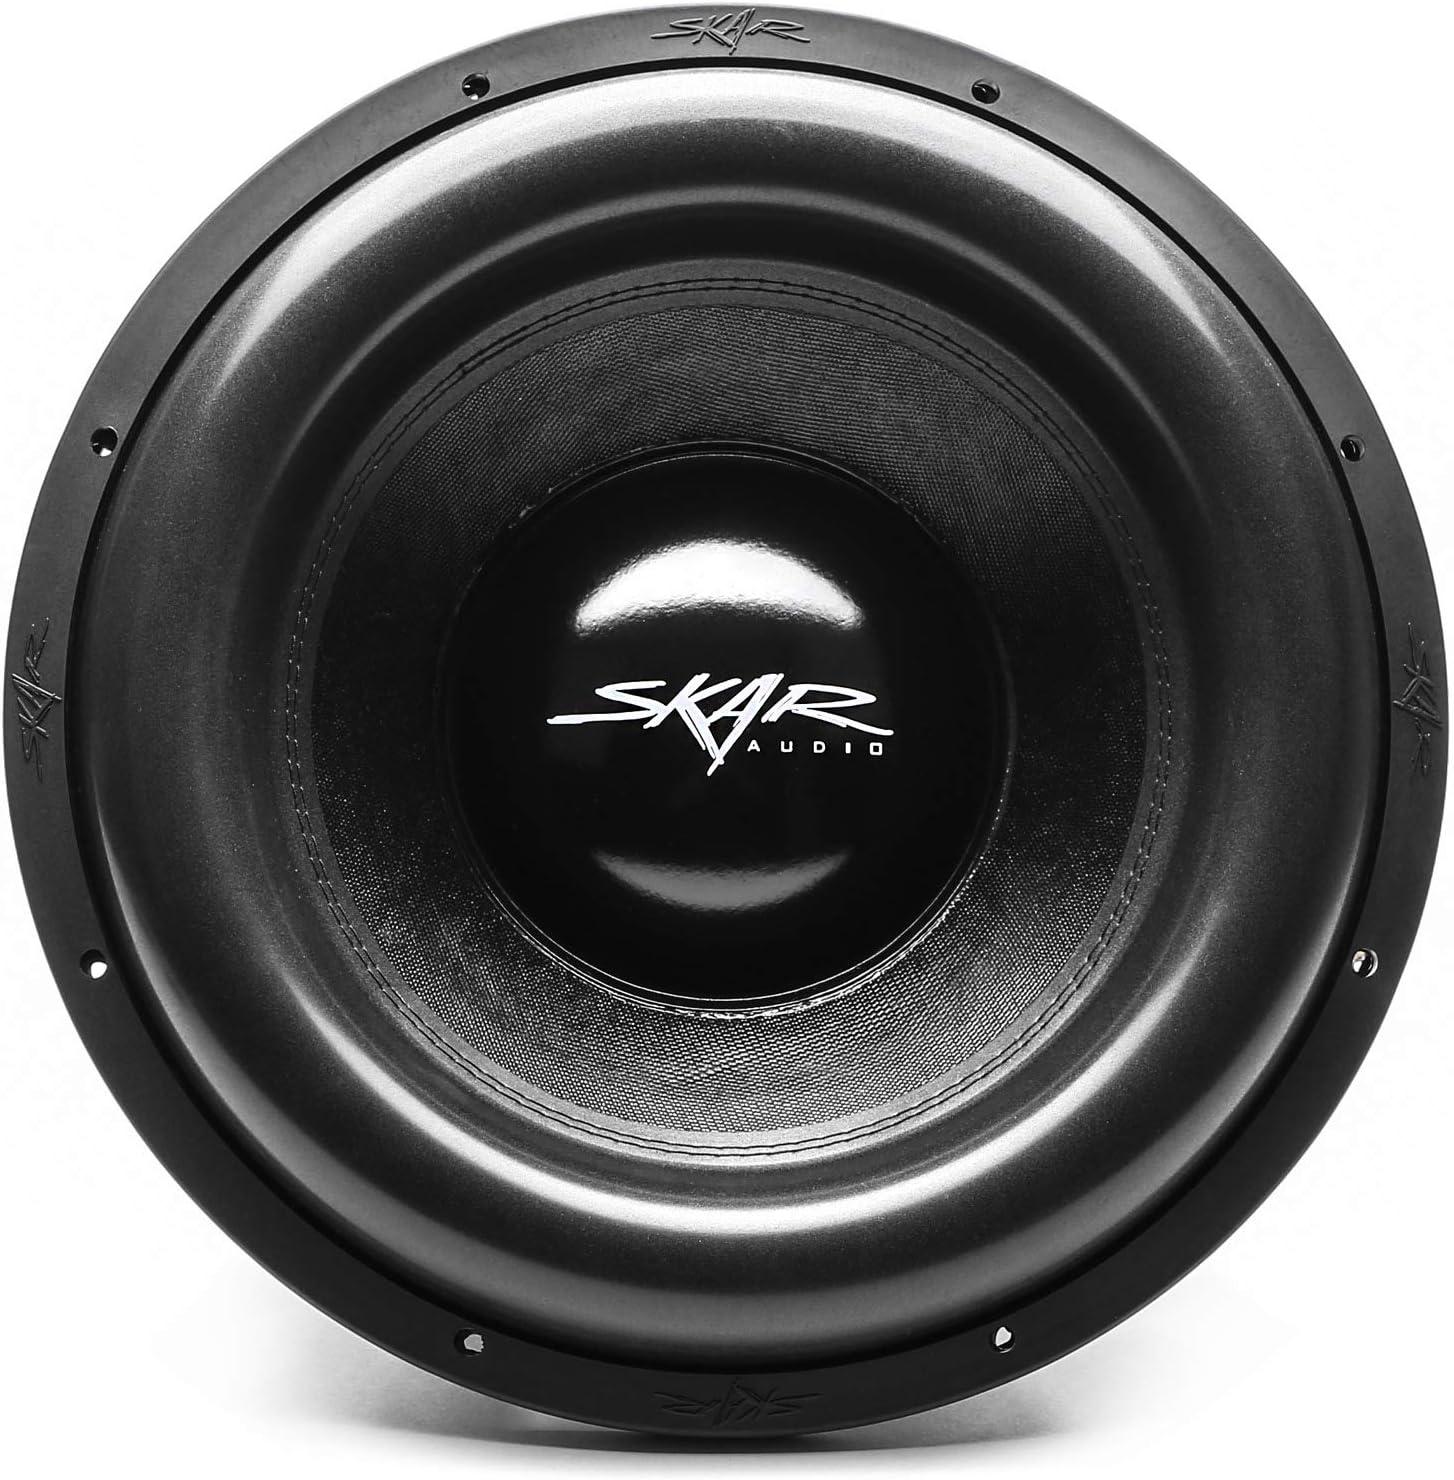 Skar Audio ZVX-12v2 D2 12 3000 Watt Max Power Dual 2 Ohm SPL Car Subwoofer